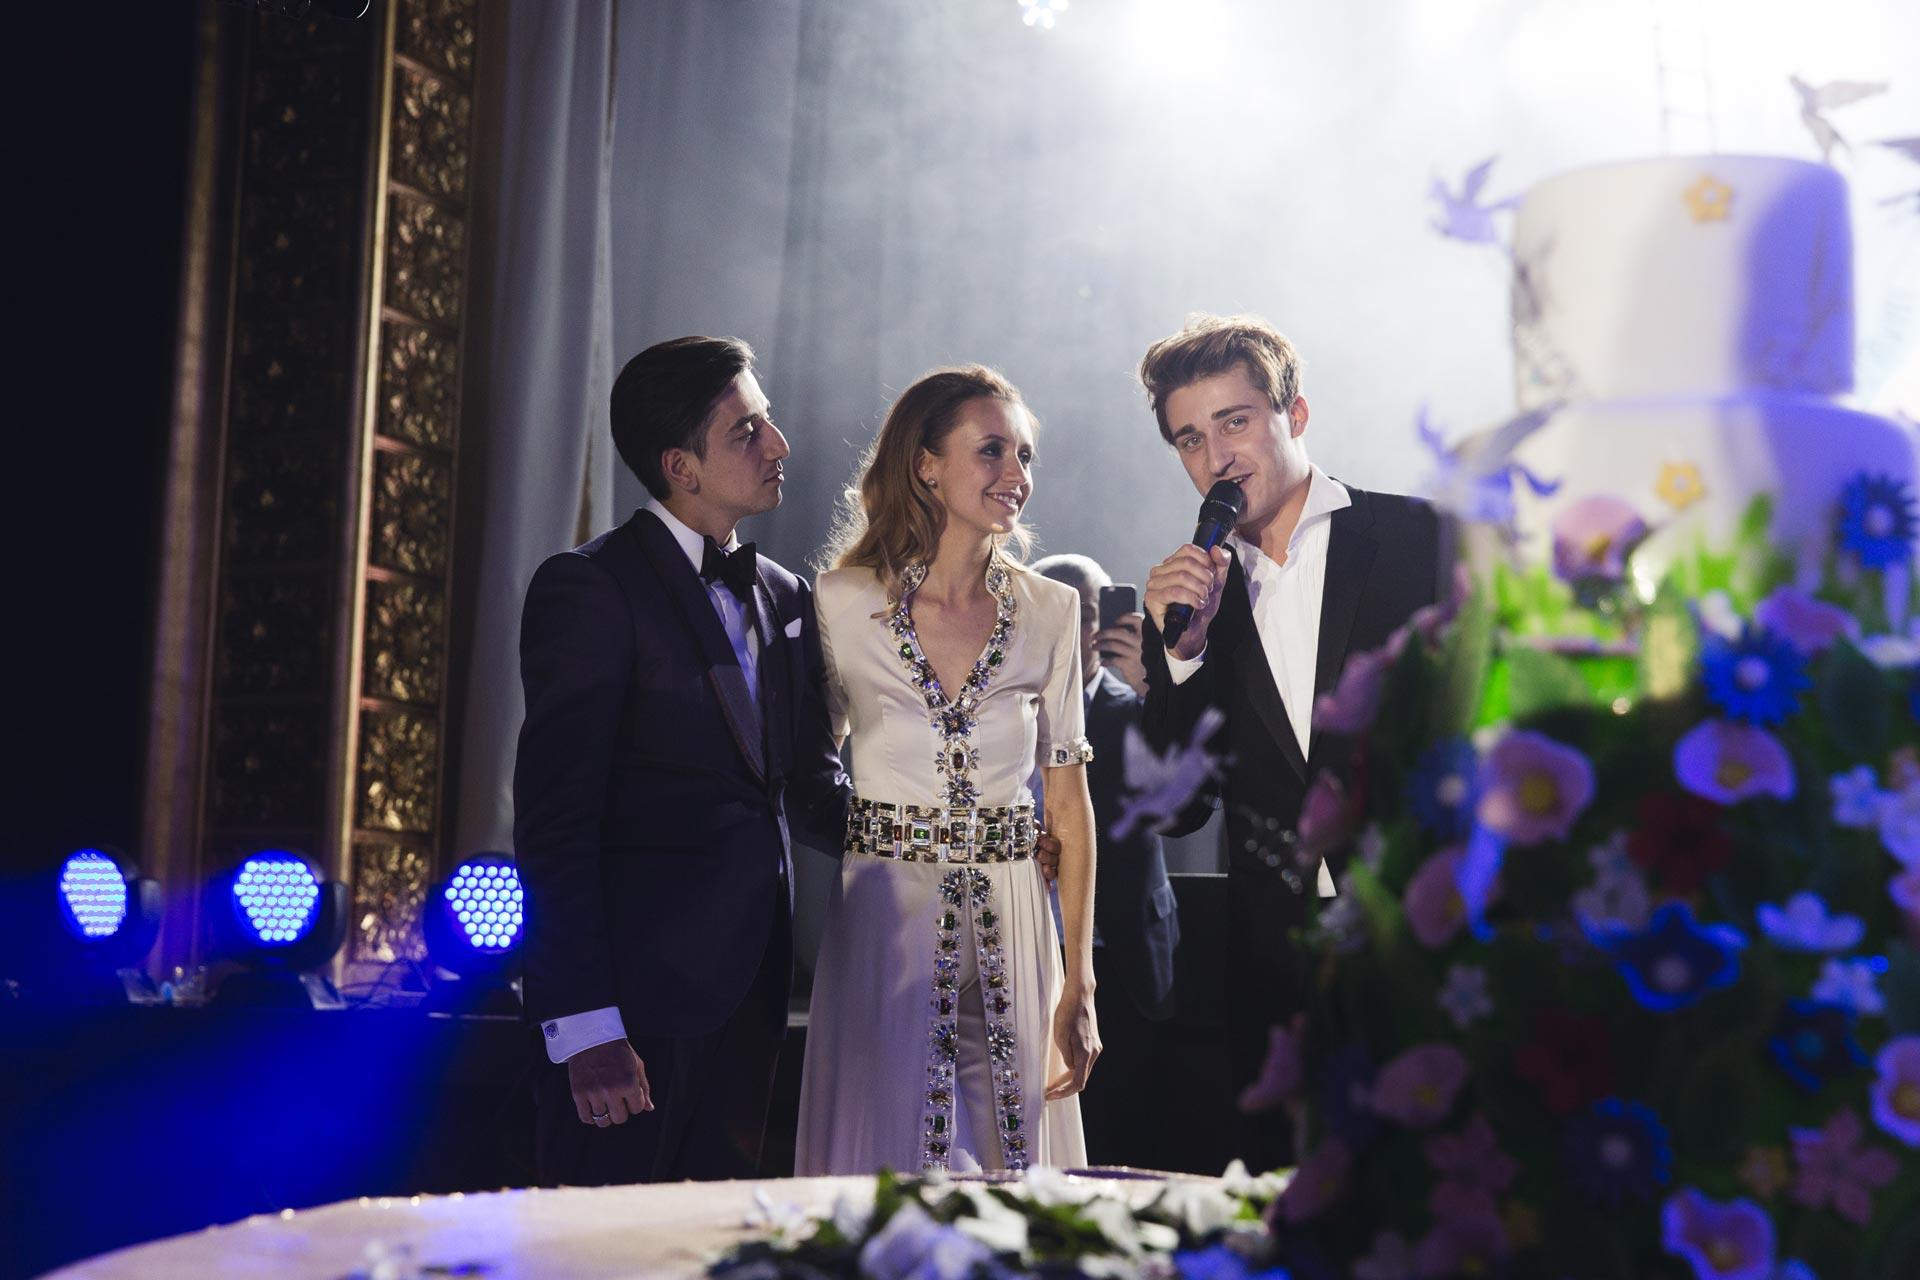 Follow me to. Свадьба Натальи и Мурада Османн фото 8